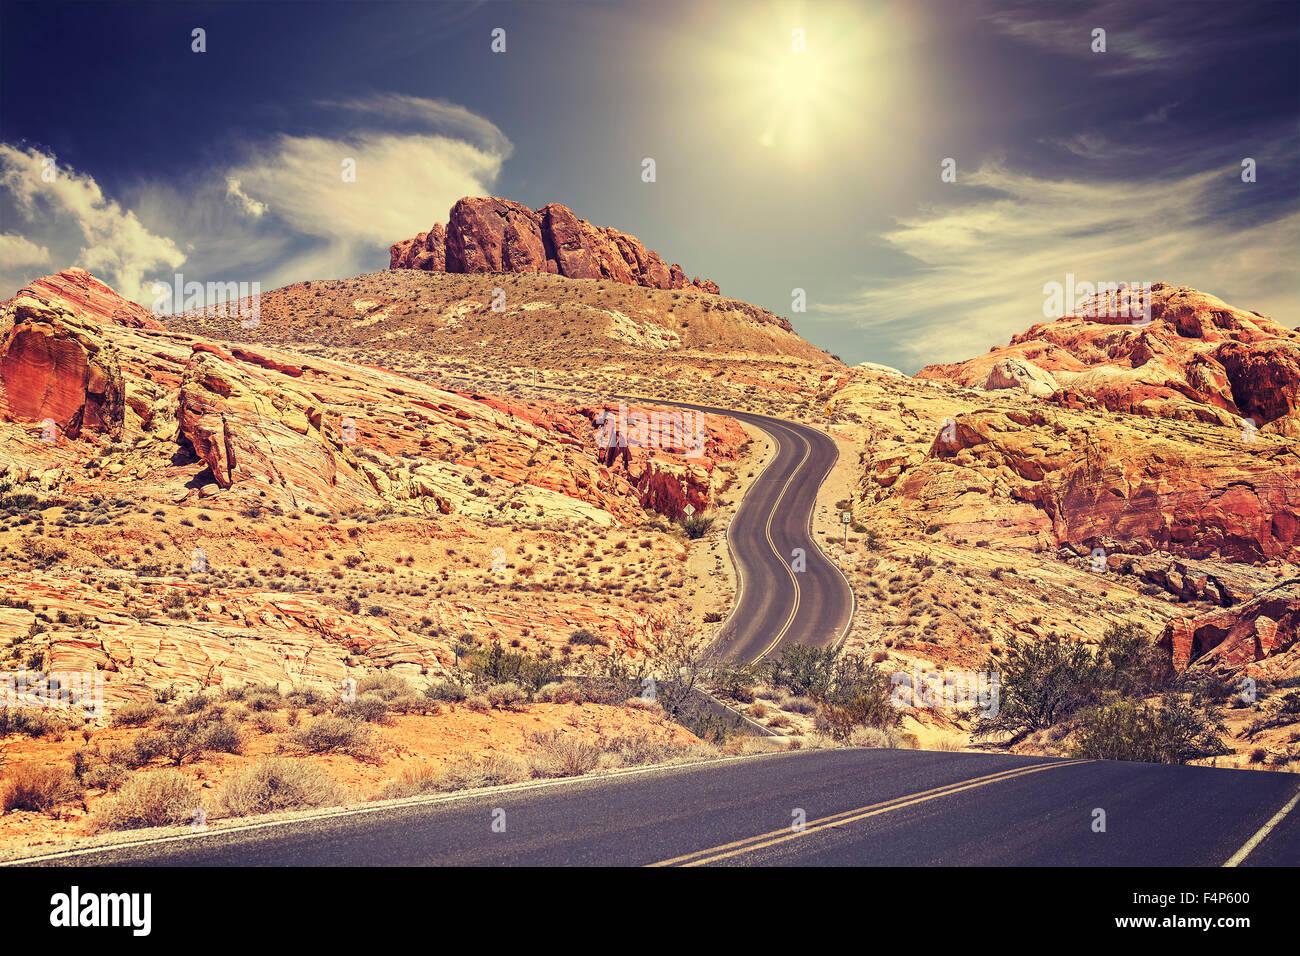 Retro imagen estilizada de un país por carretera, concepto de viaje, USA. Imagen De Stock